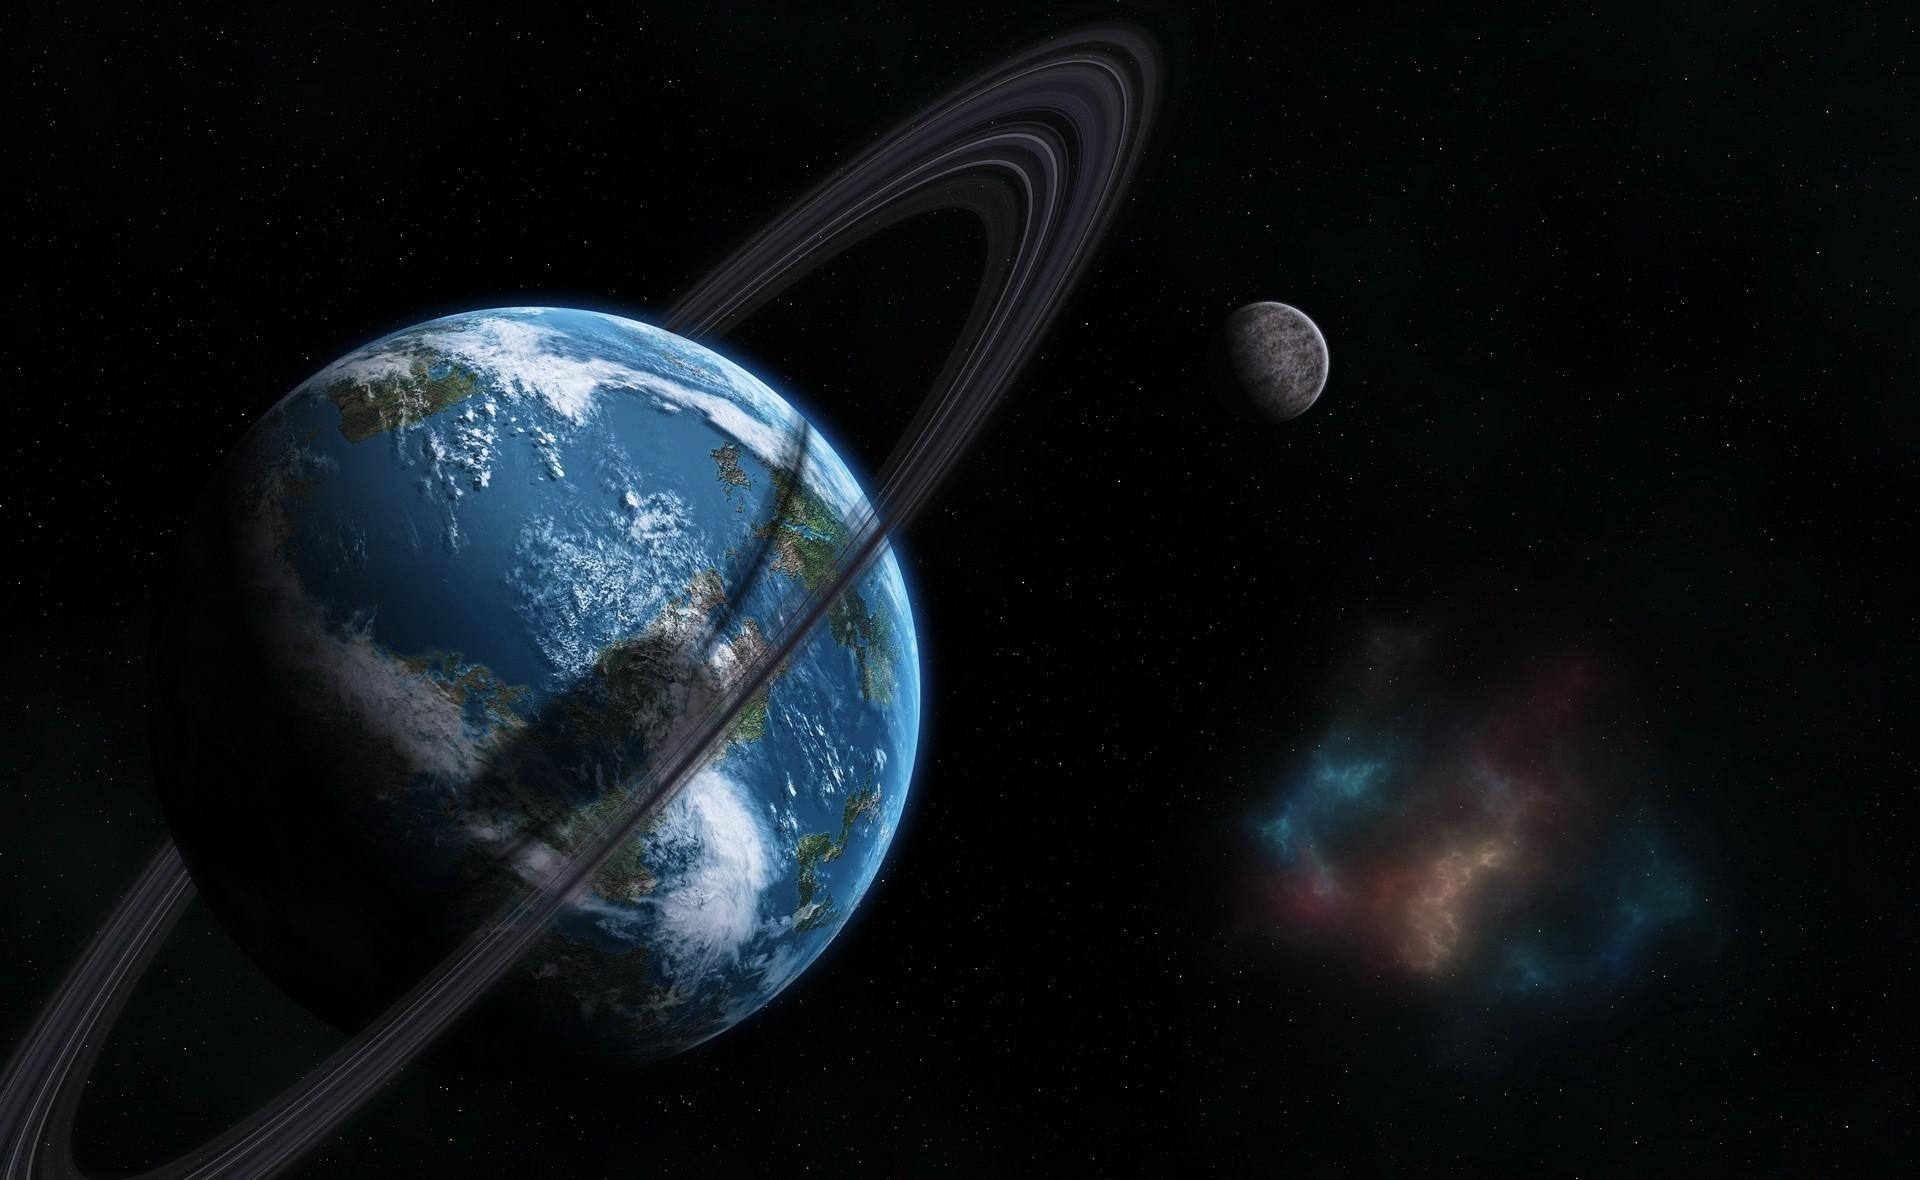 hd neptune planet rings - photo #22